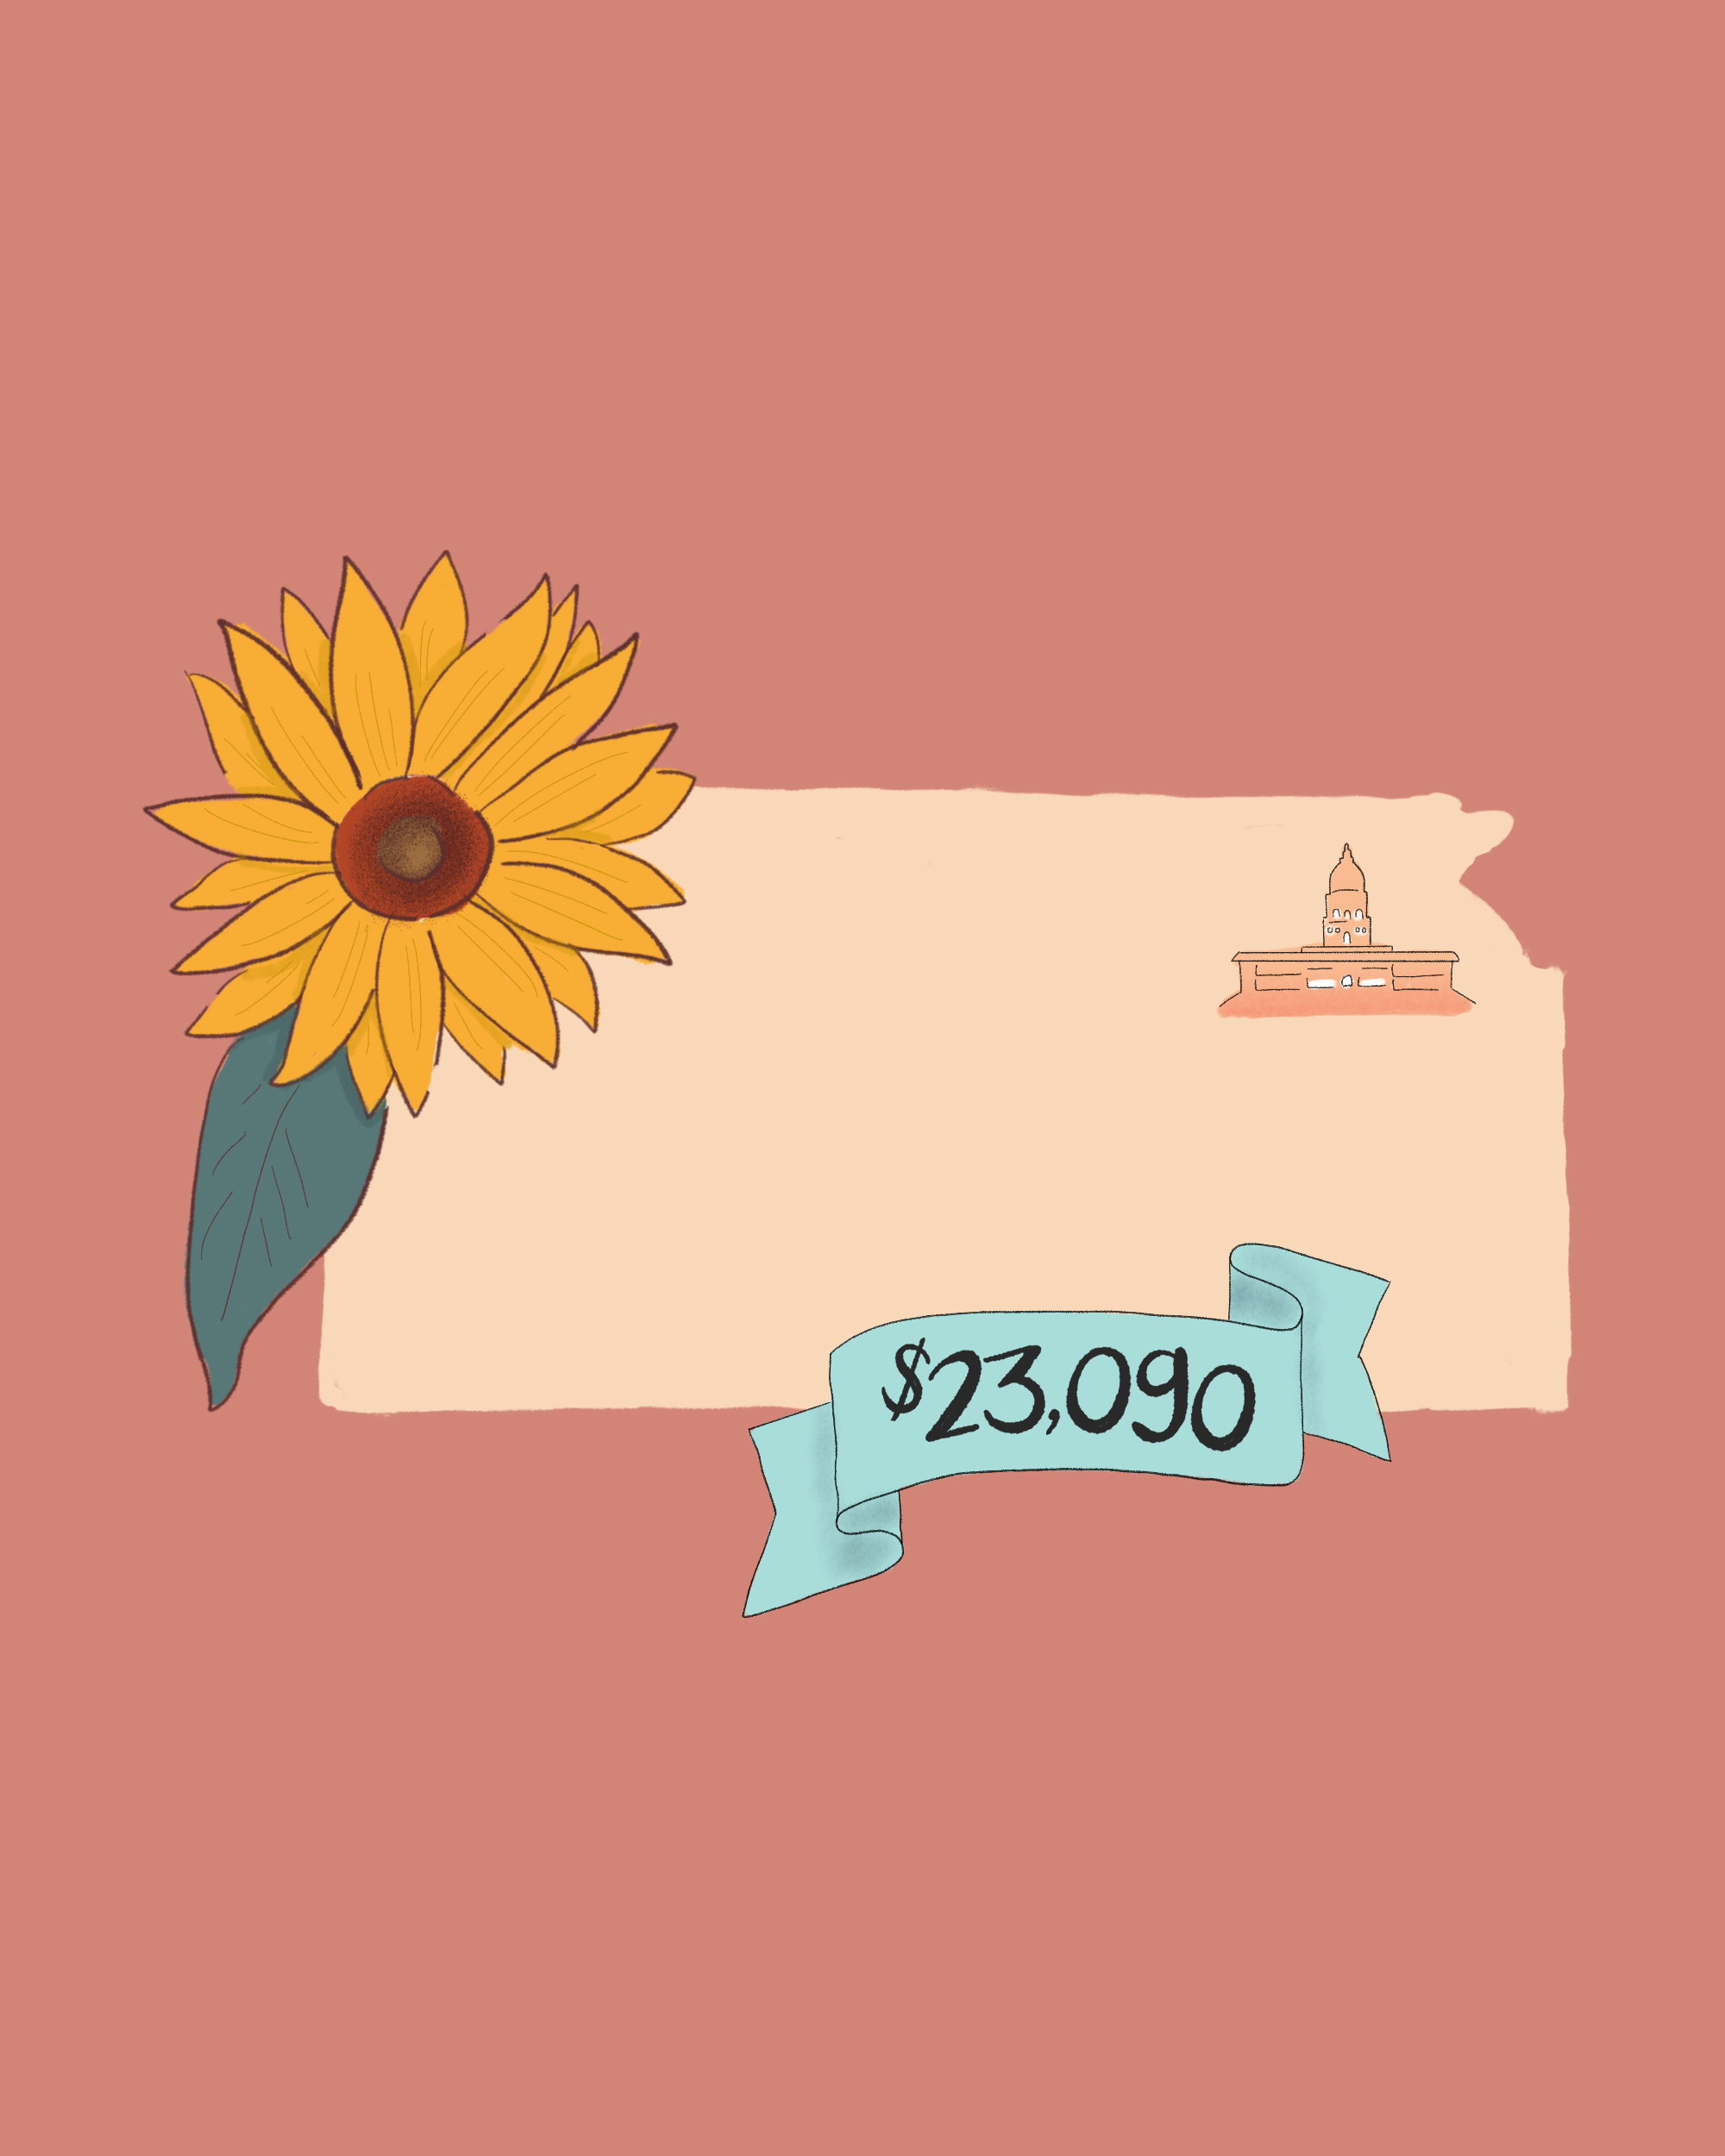 state wedding costs illustration kansas